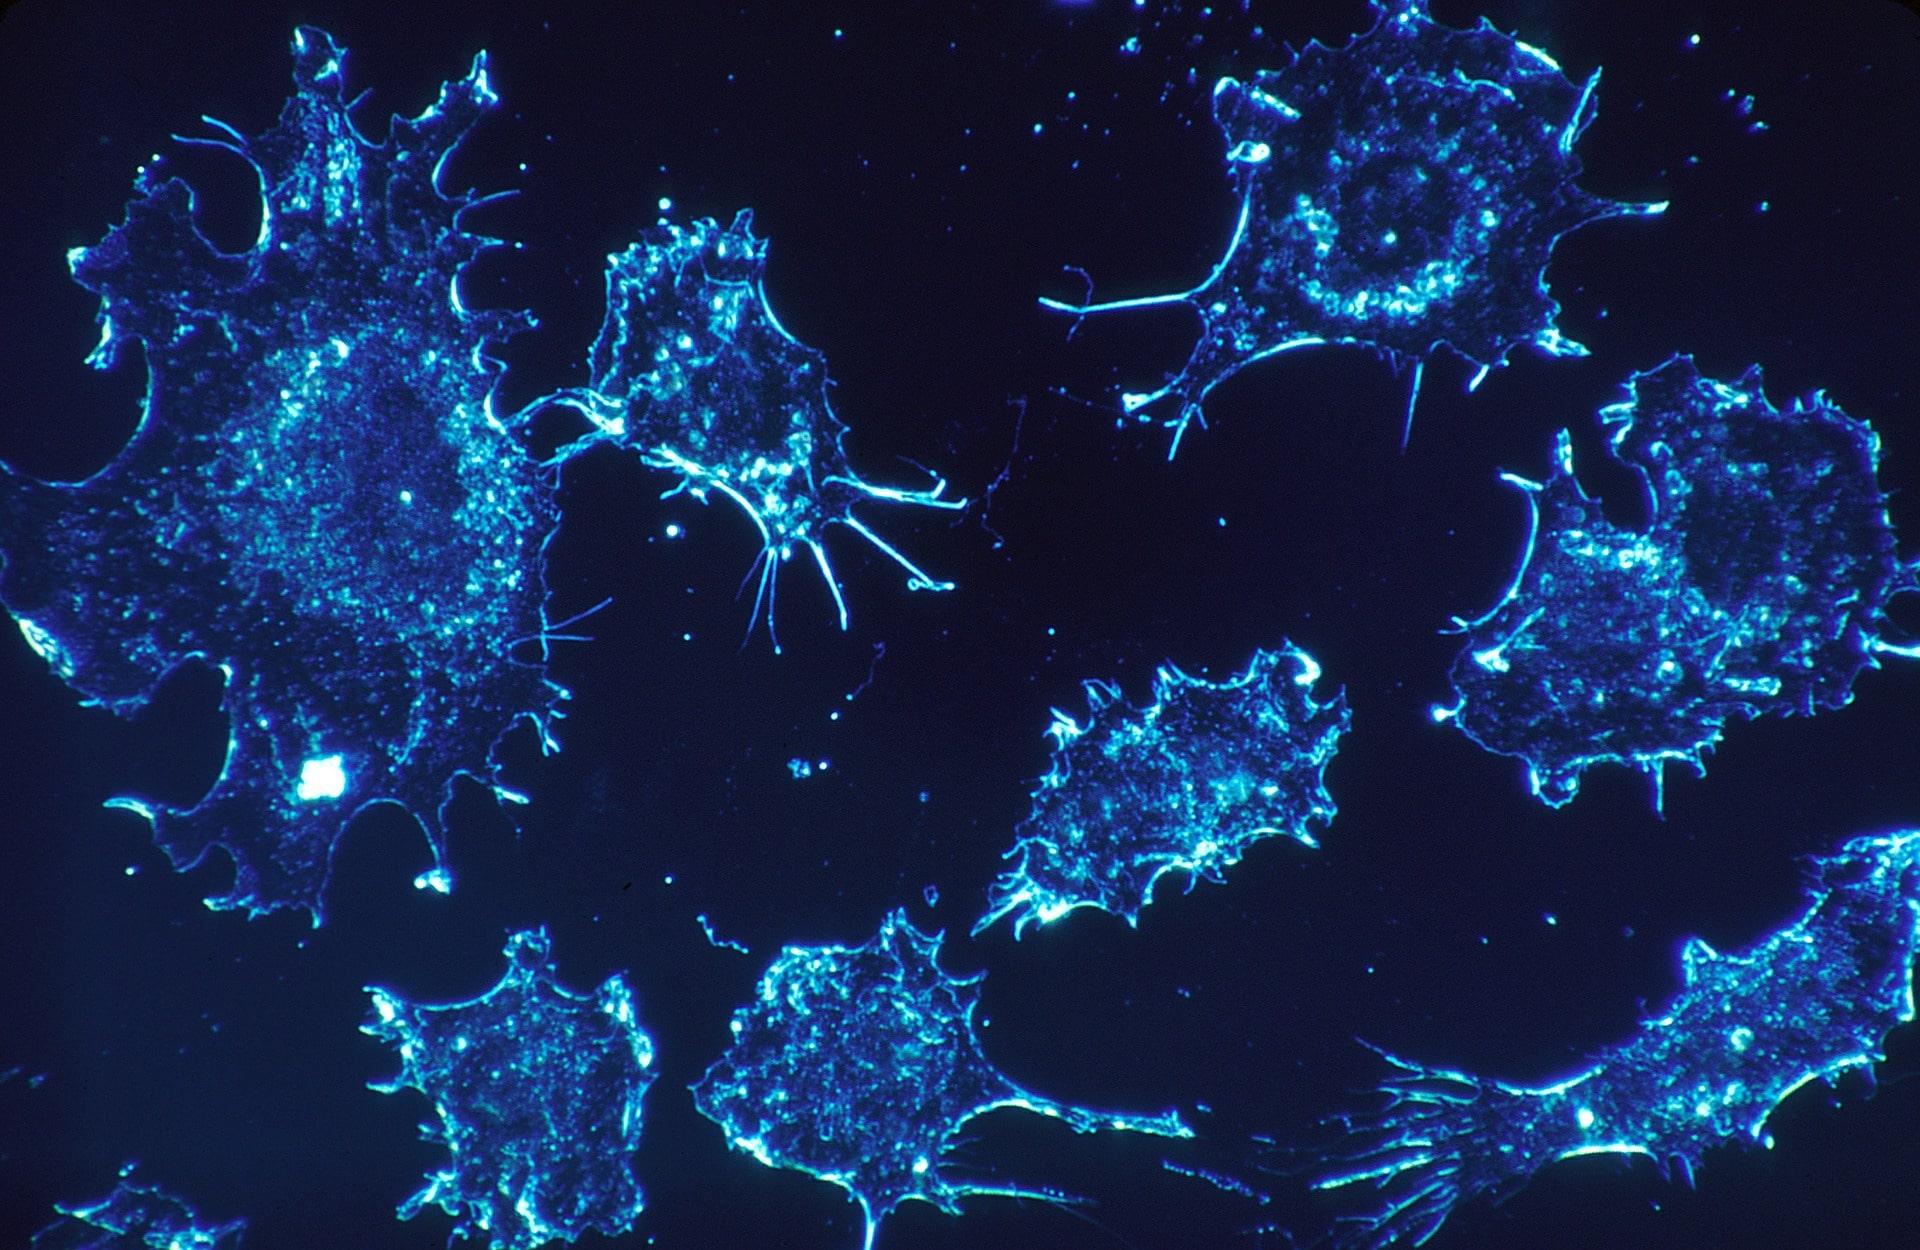 Krebszellen unter dem Mikroskop